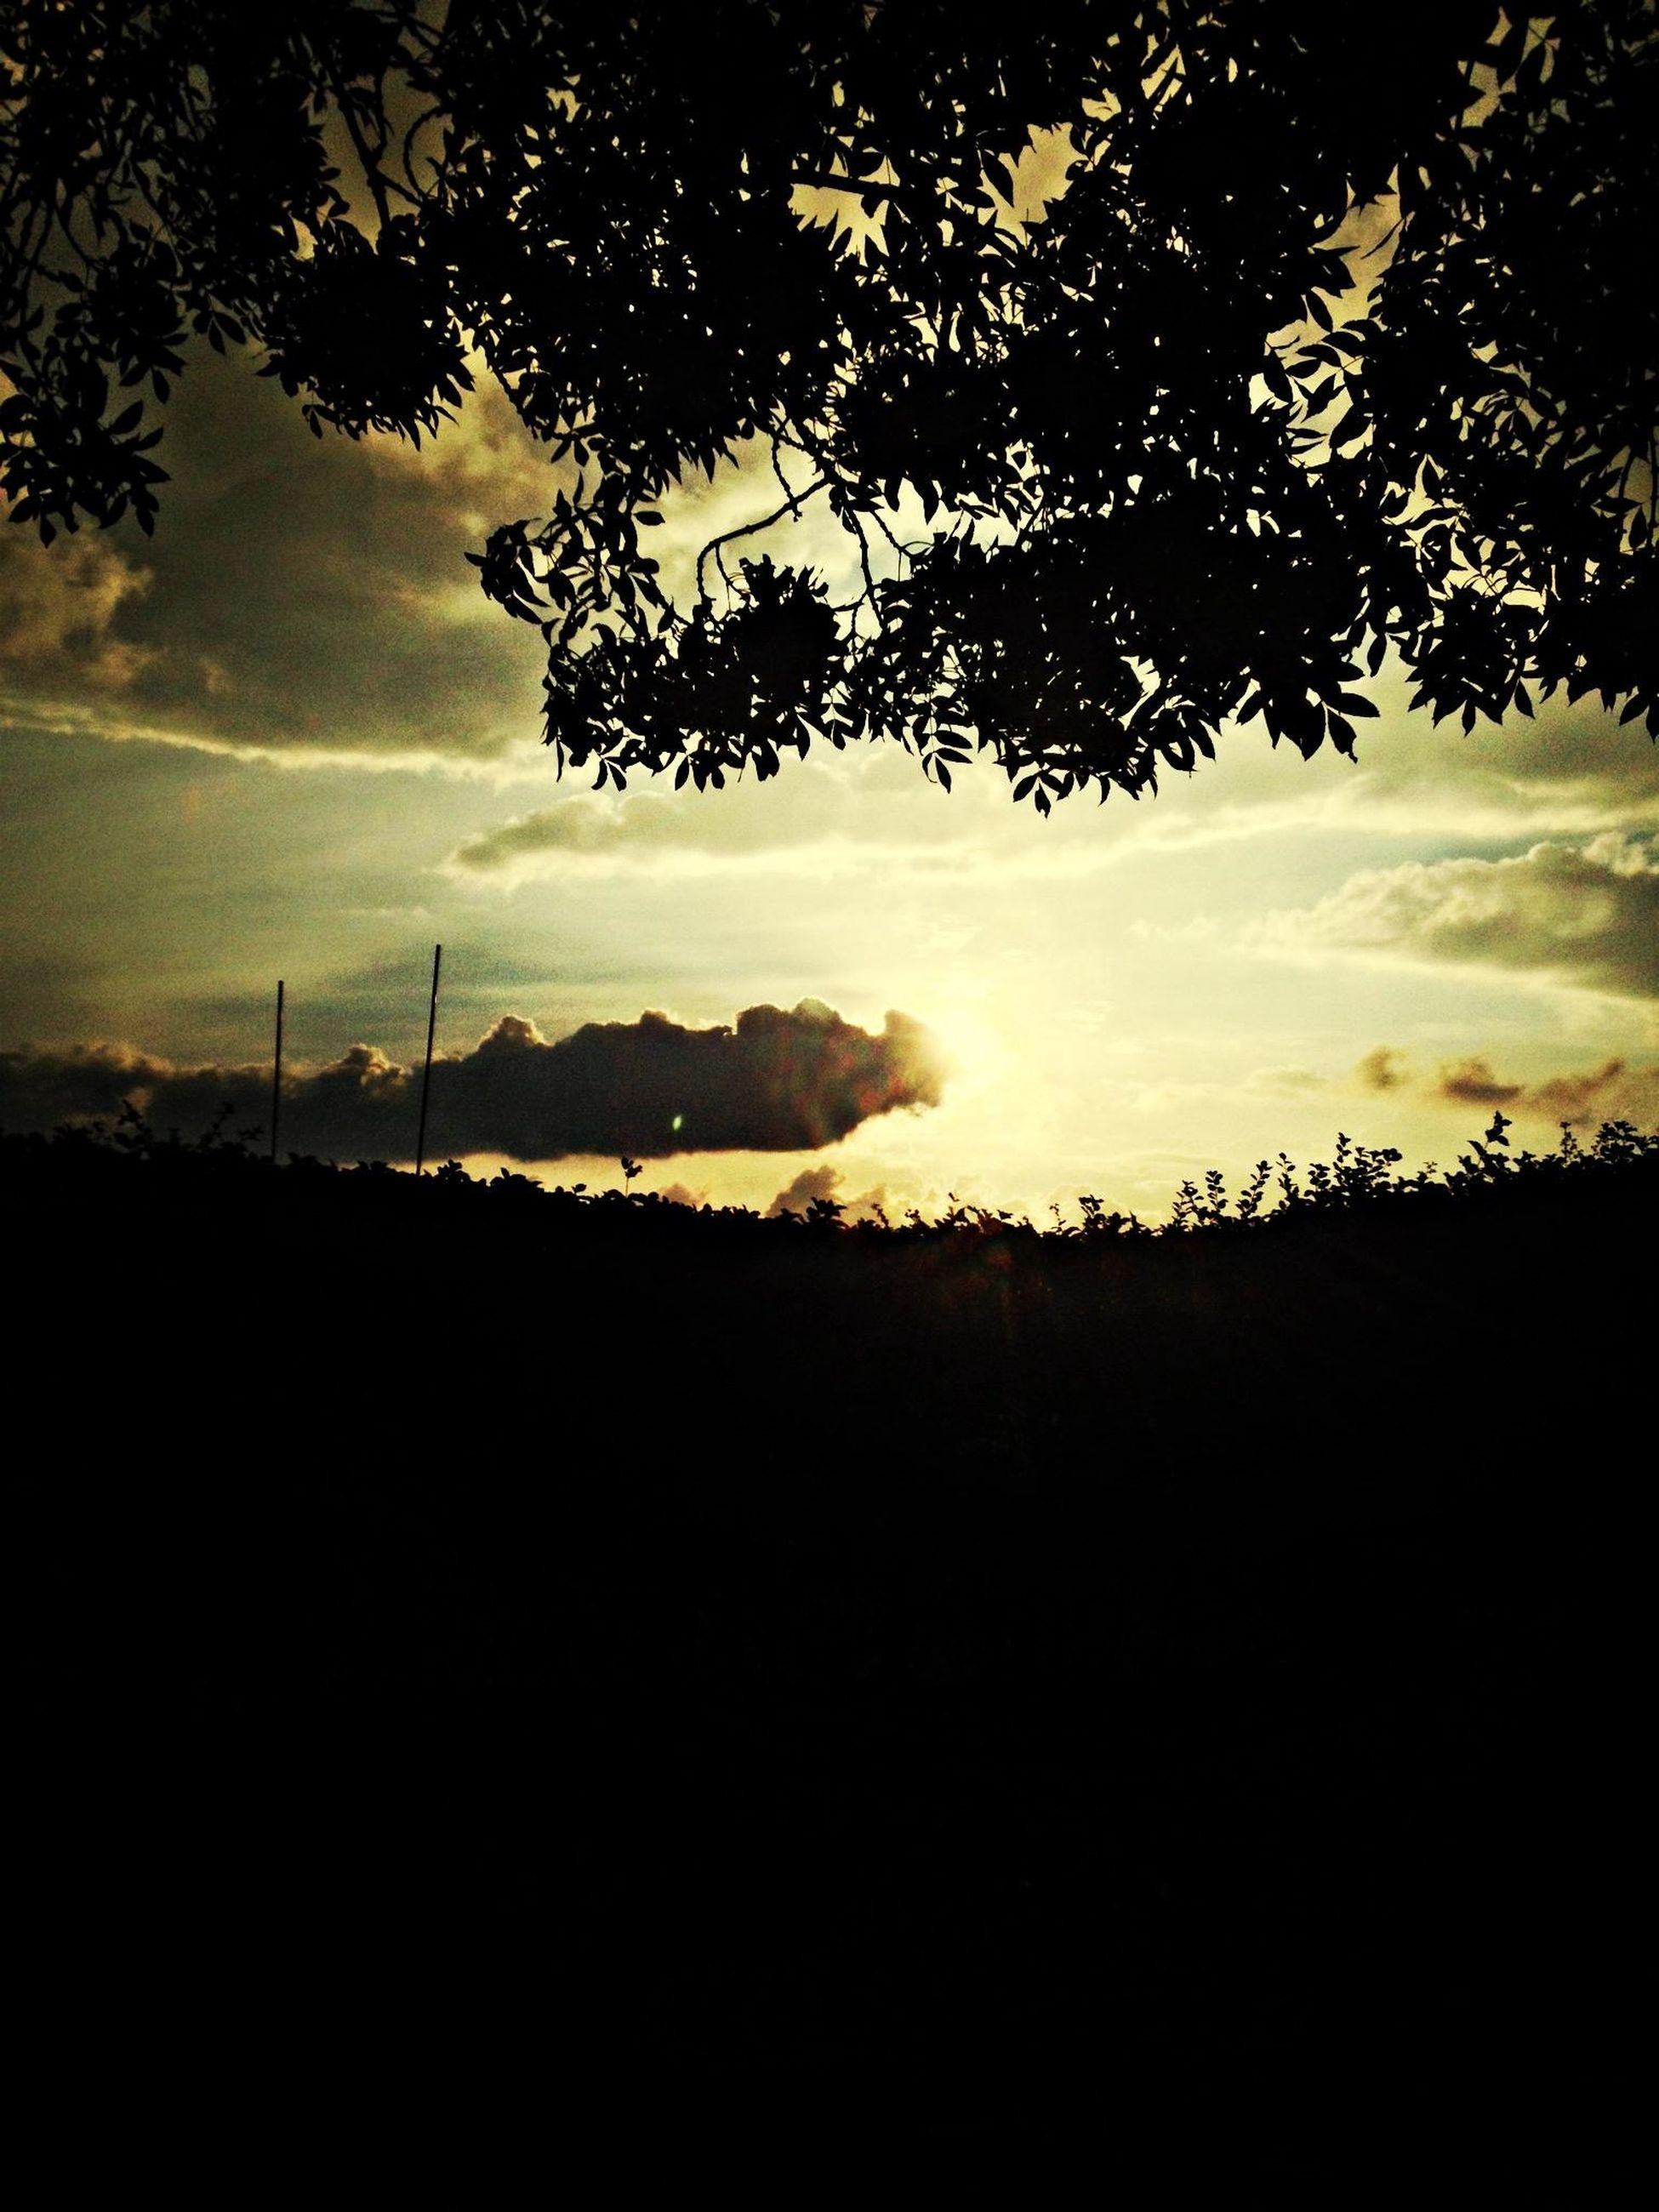 silhouette, sunset, sky, tranquility, tranquil scene, scenics, beauty in nature, tree, cloud - sky, landscape, nature, dark, cloudy, idyllic, field, dusk, electricity pylon, weather, cloud, outdoors